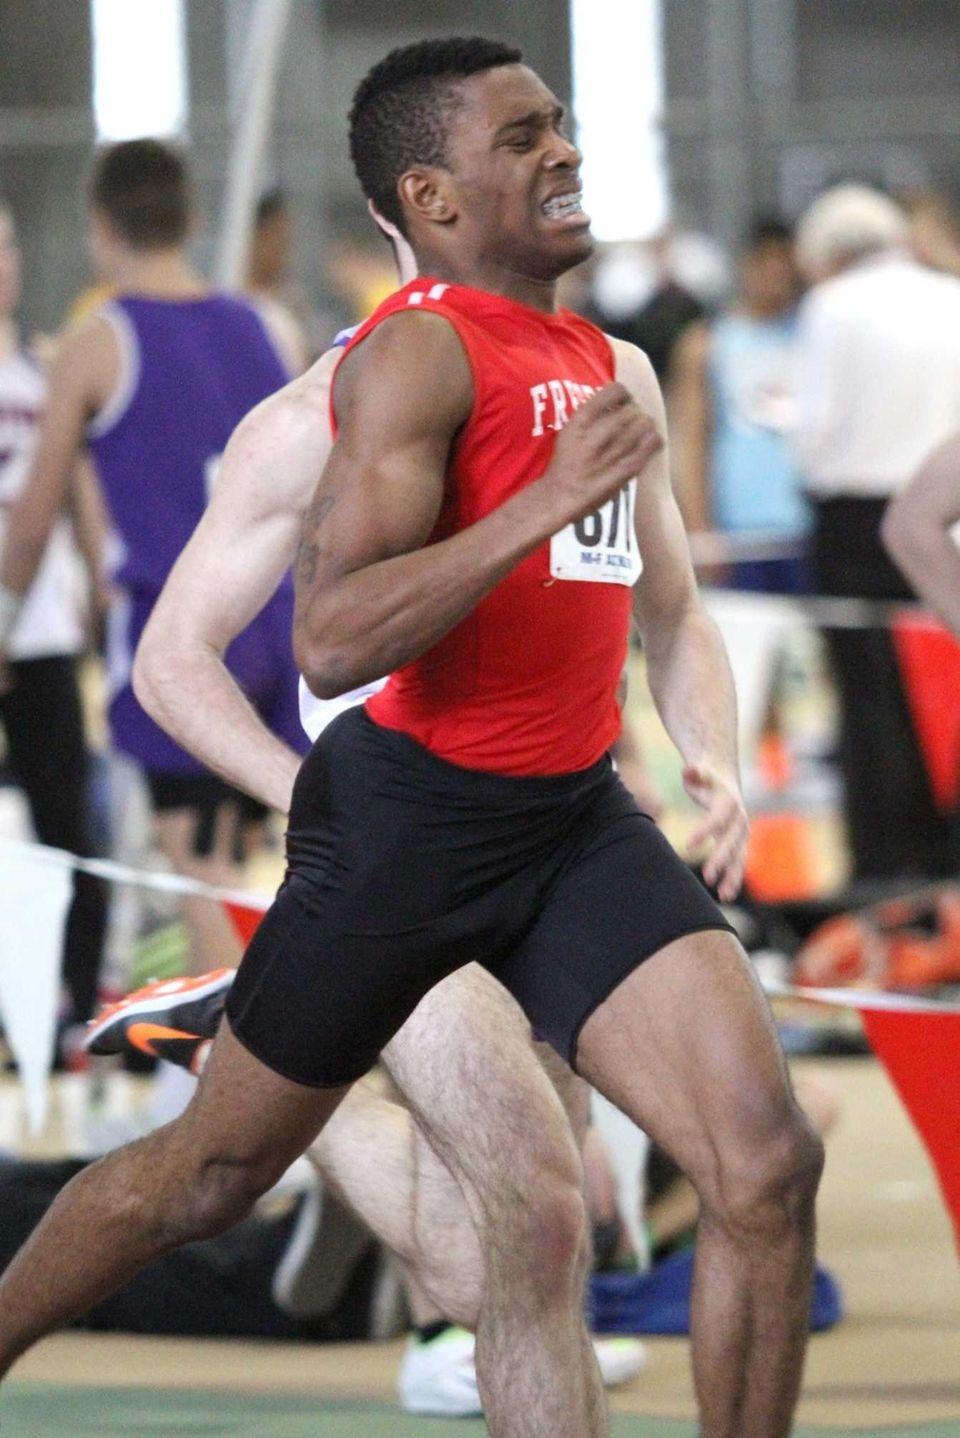 Freeport's Jonathan Greenwood pushes to the finish line